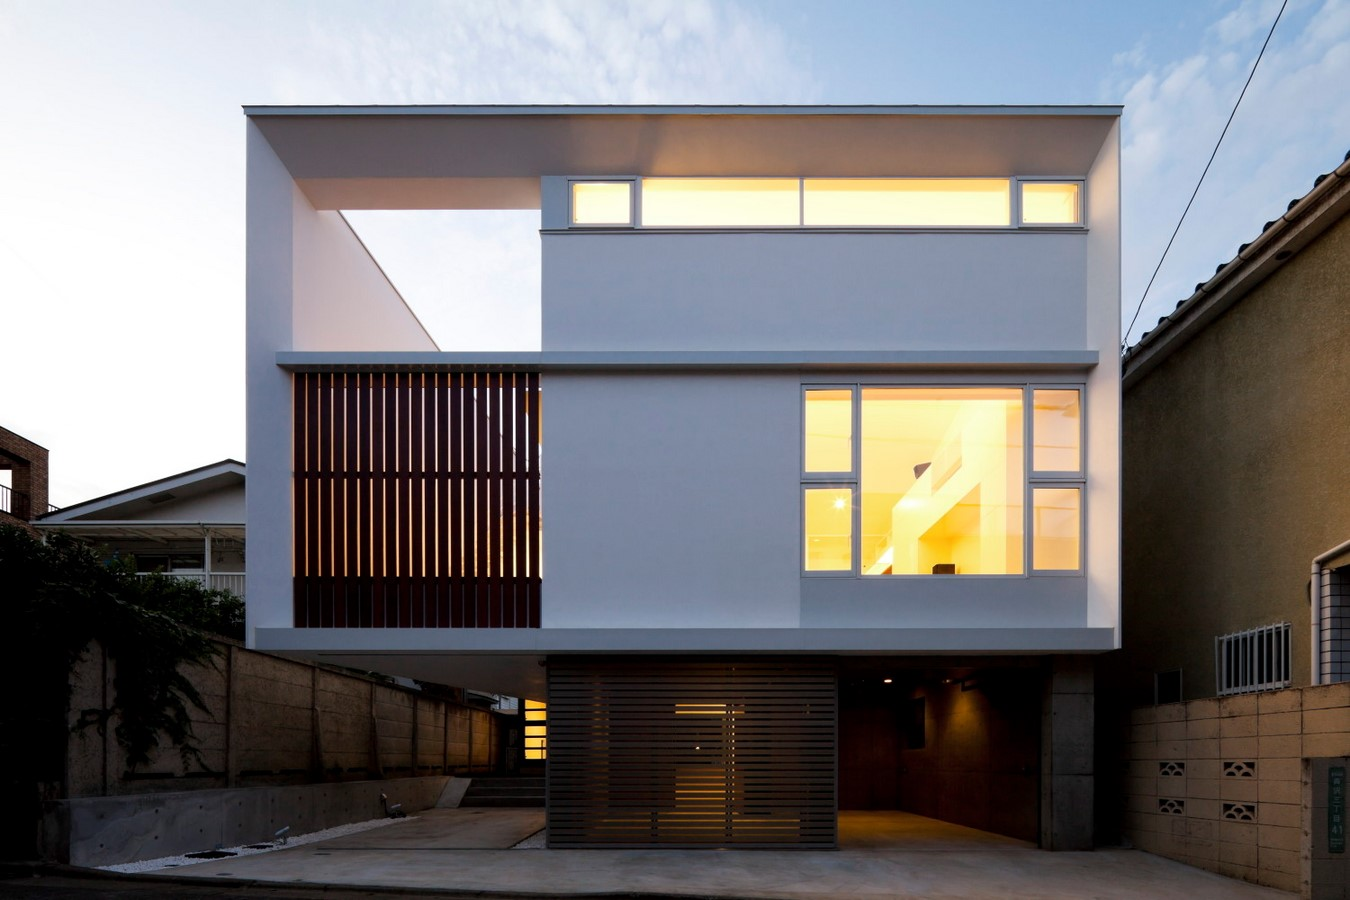 15 minimalistic facades around the world - Sheet11